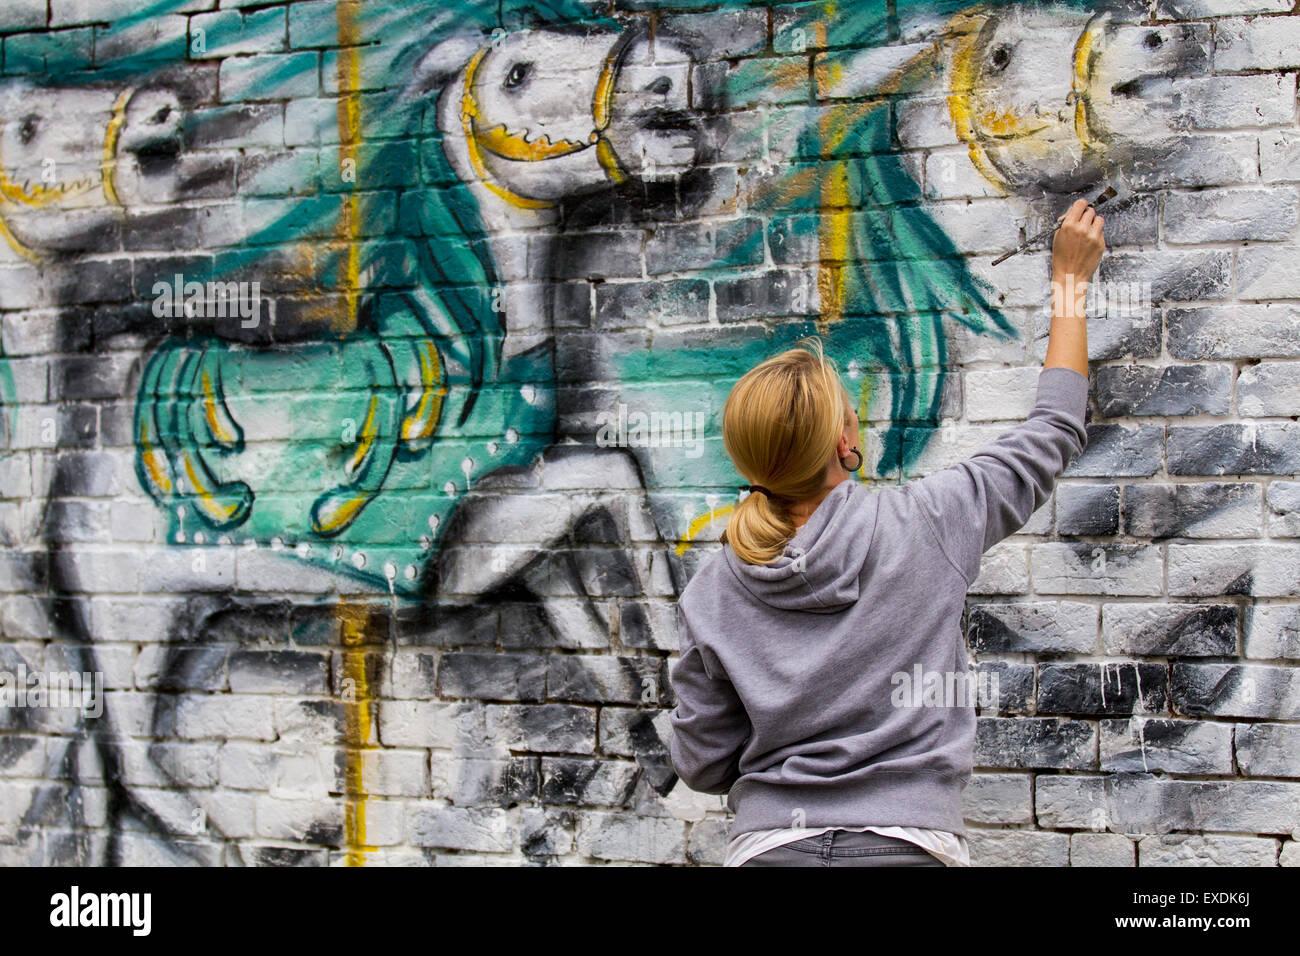 Cookson st alquiler de sitio del parque, Blackpool, Lancashire, Reino Unido. 12 de julio de 2015. Leona Bell pintura Imagen De Stock